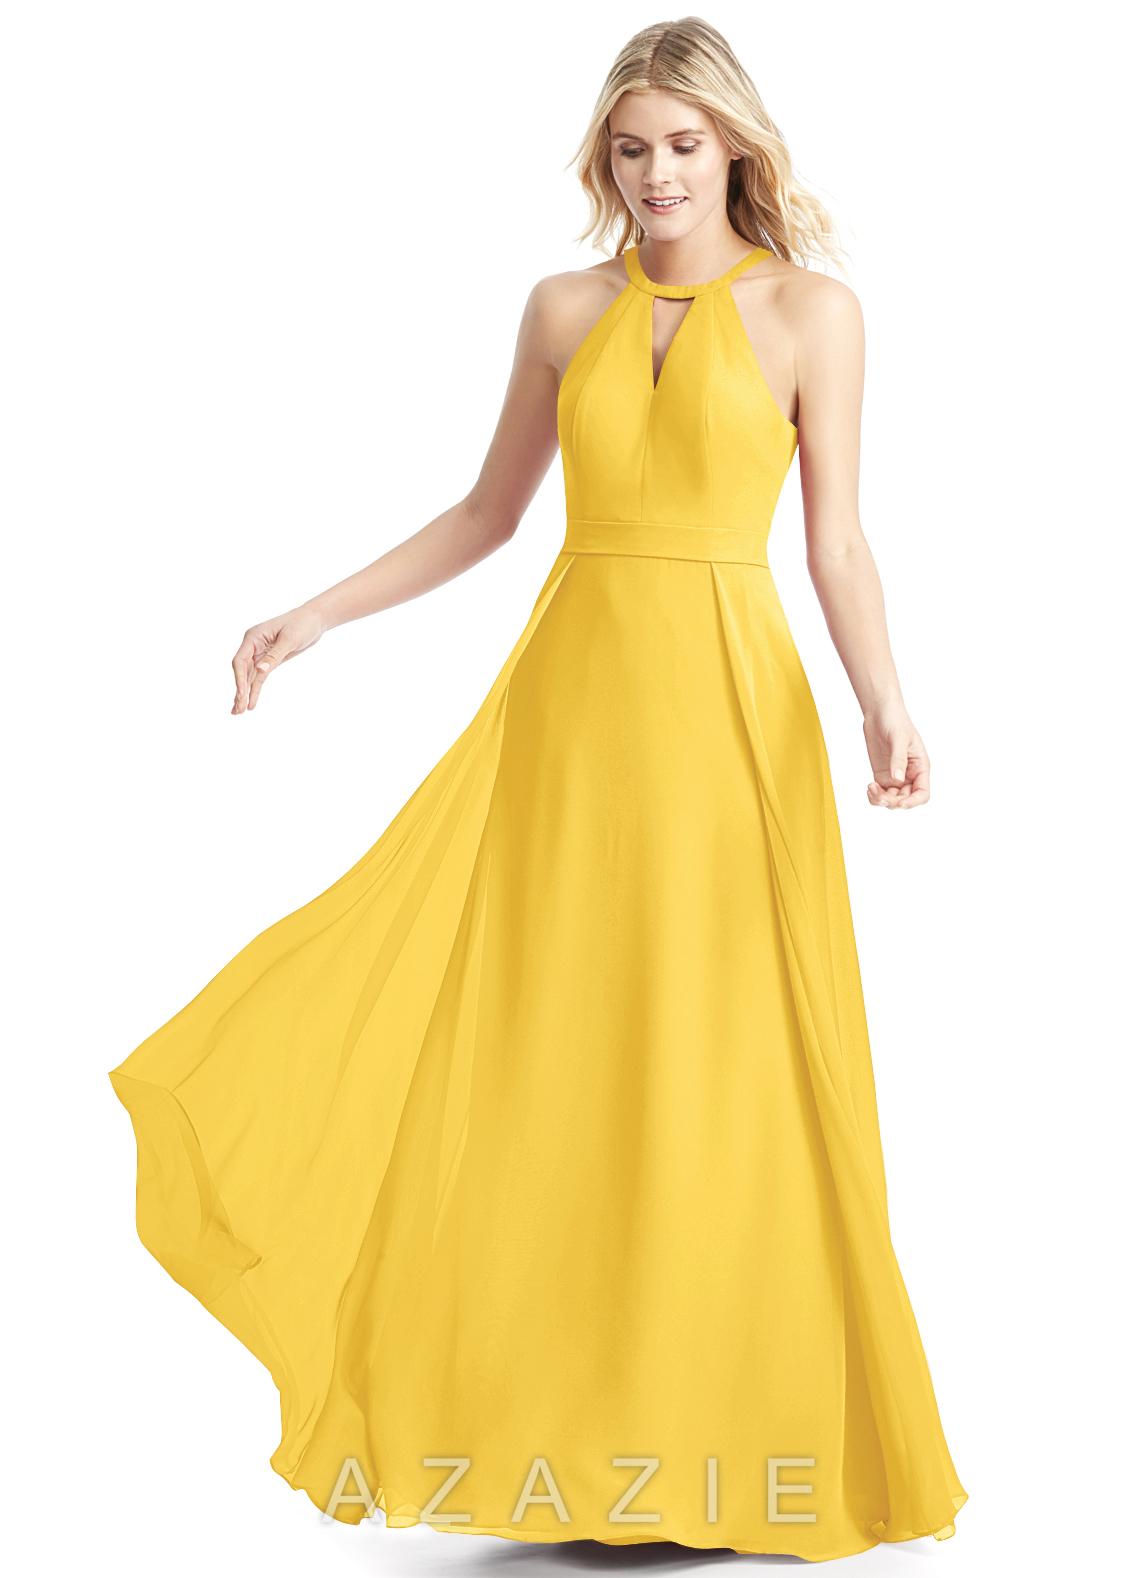 0b7bbc4afec Azazie Melody Bridesmaid Dress - Marigold